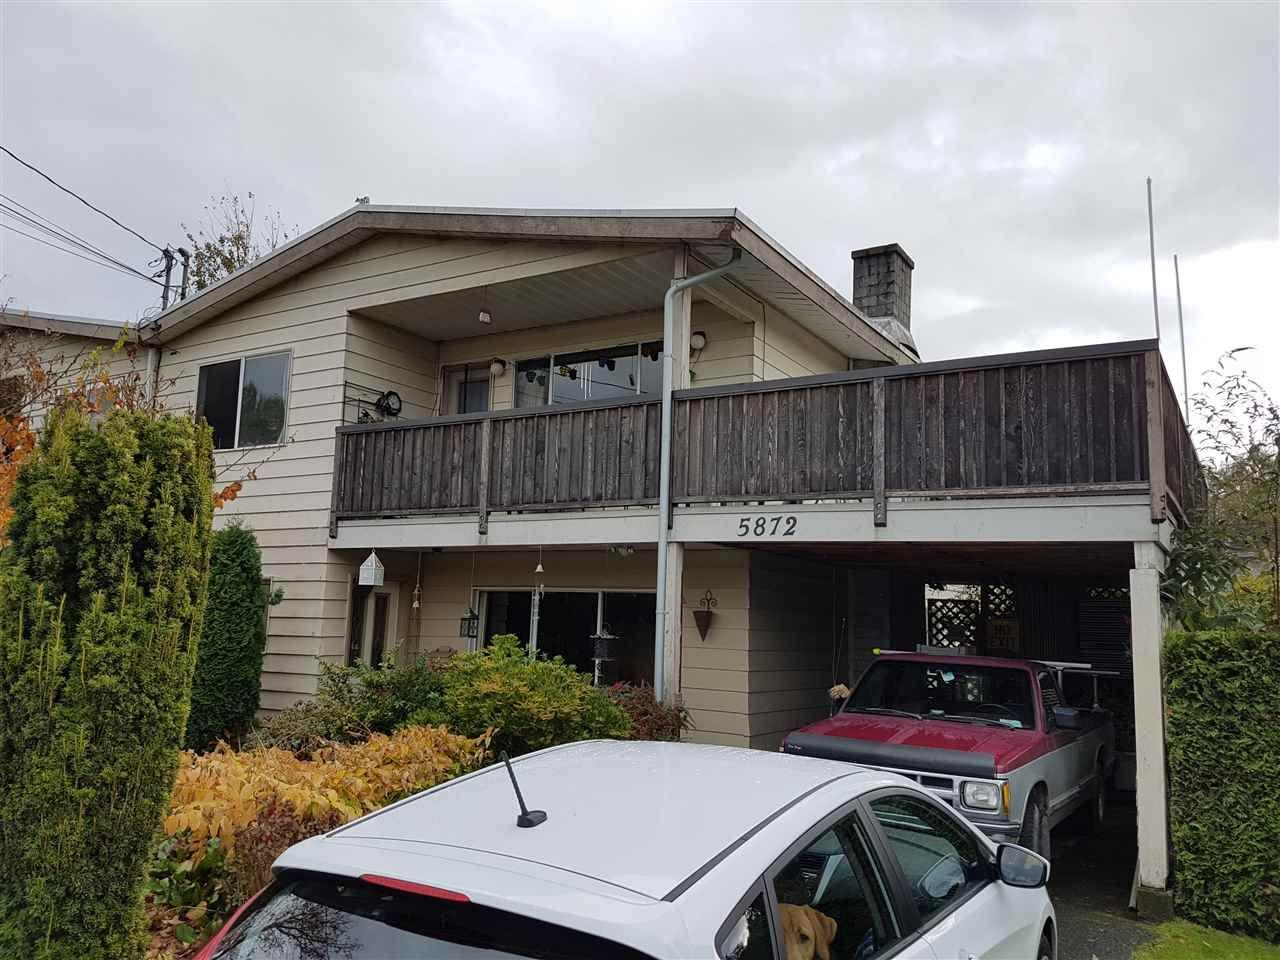 Main Photo: 5872 17A AVENUE in Delta: Beach Grove 1/2 Duplex for sale (Tsawwassen)  : MLS®# R2118472